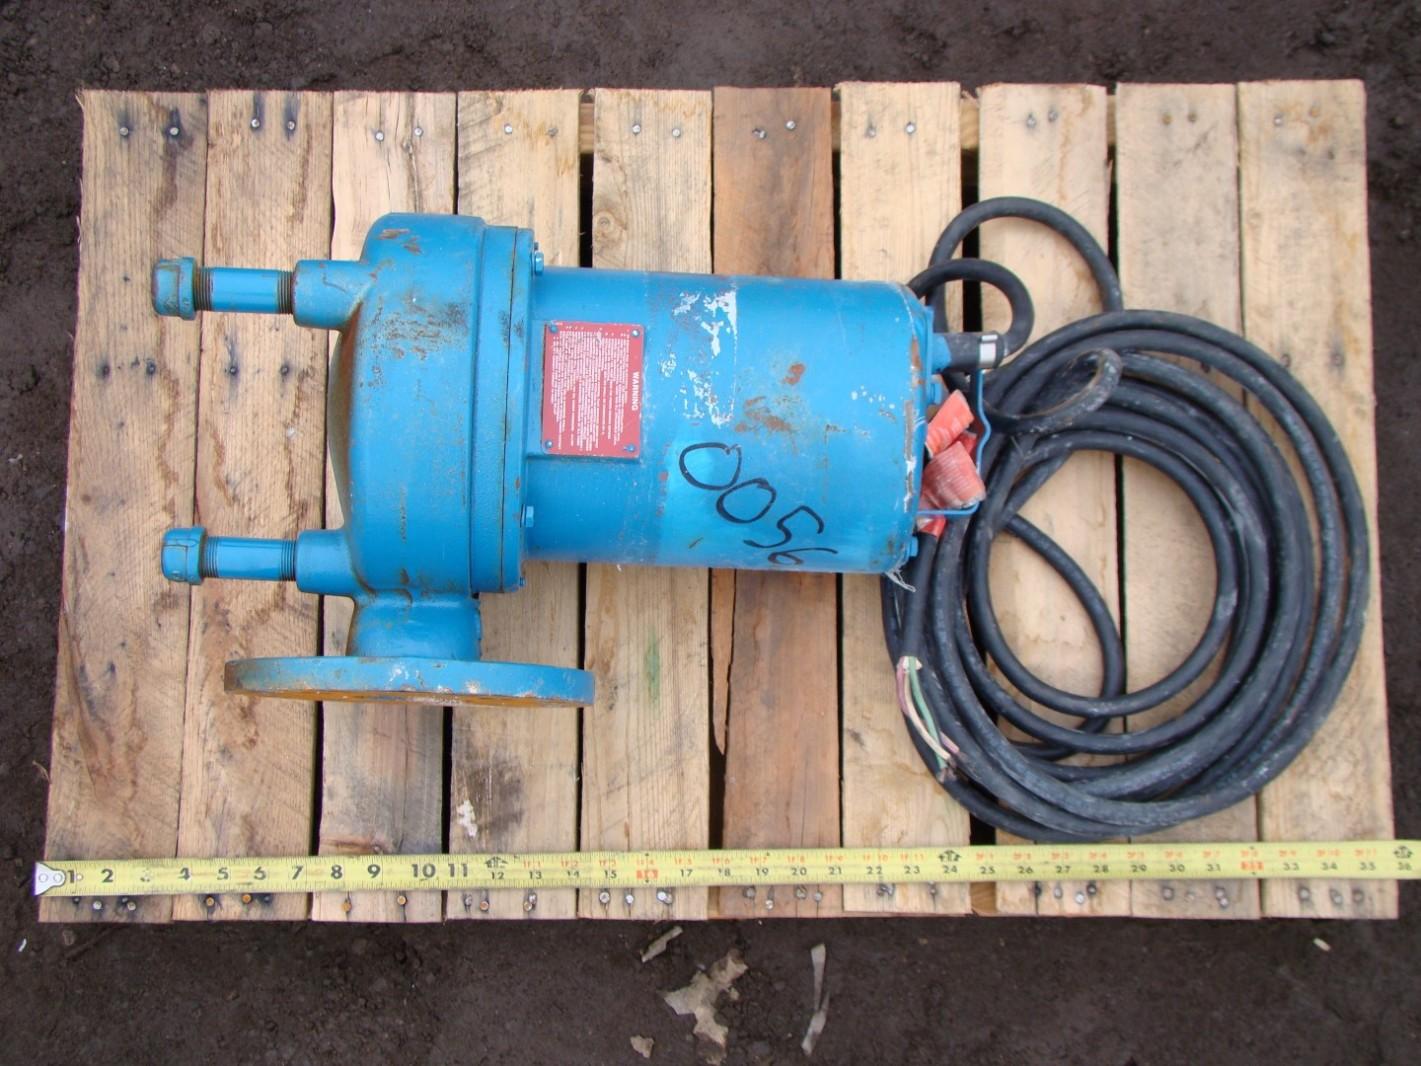 pump pumps dirt oil sump model bert inc barns barnes late system